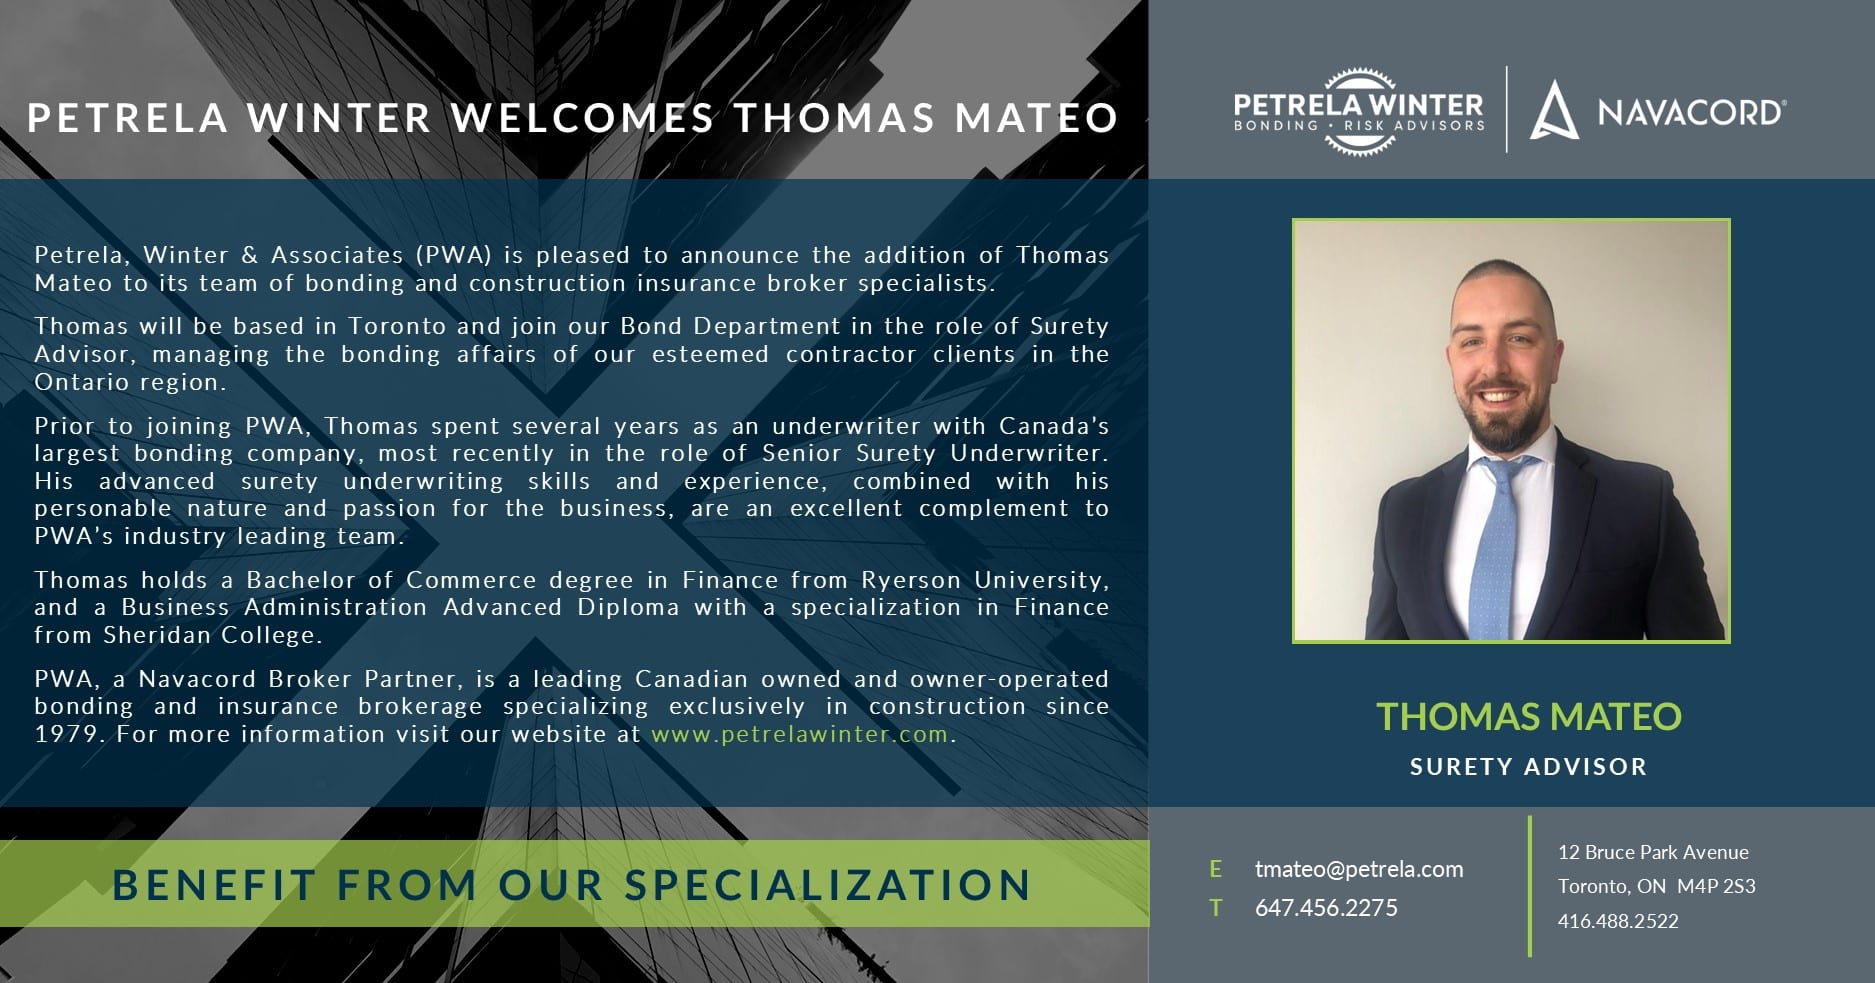 Thomas Mateo